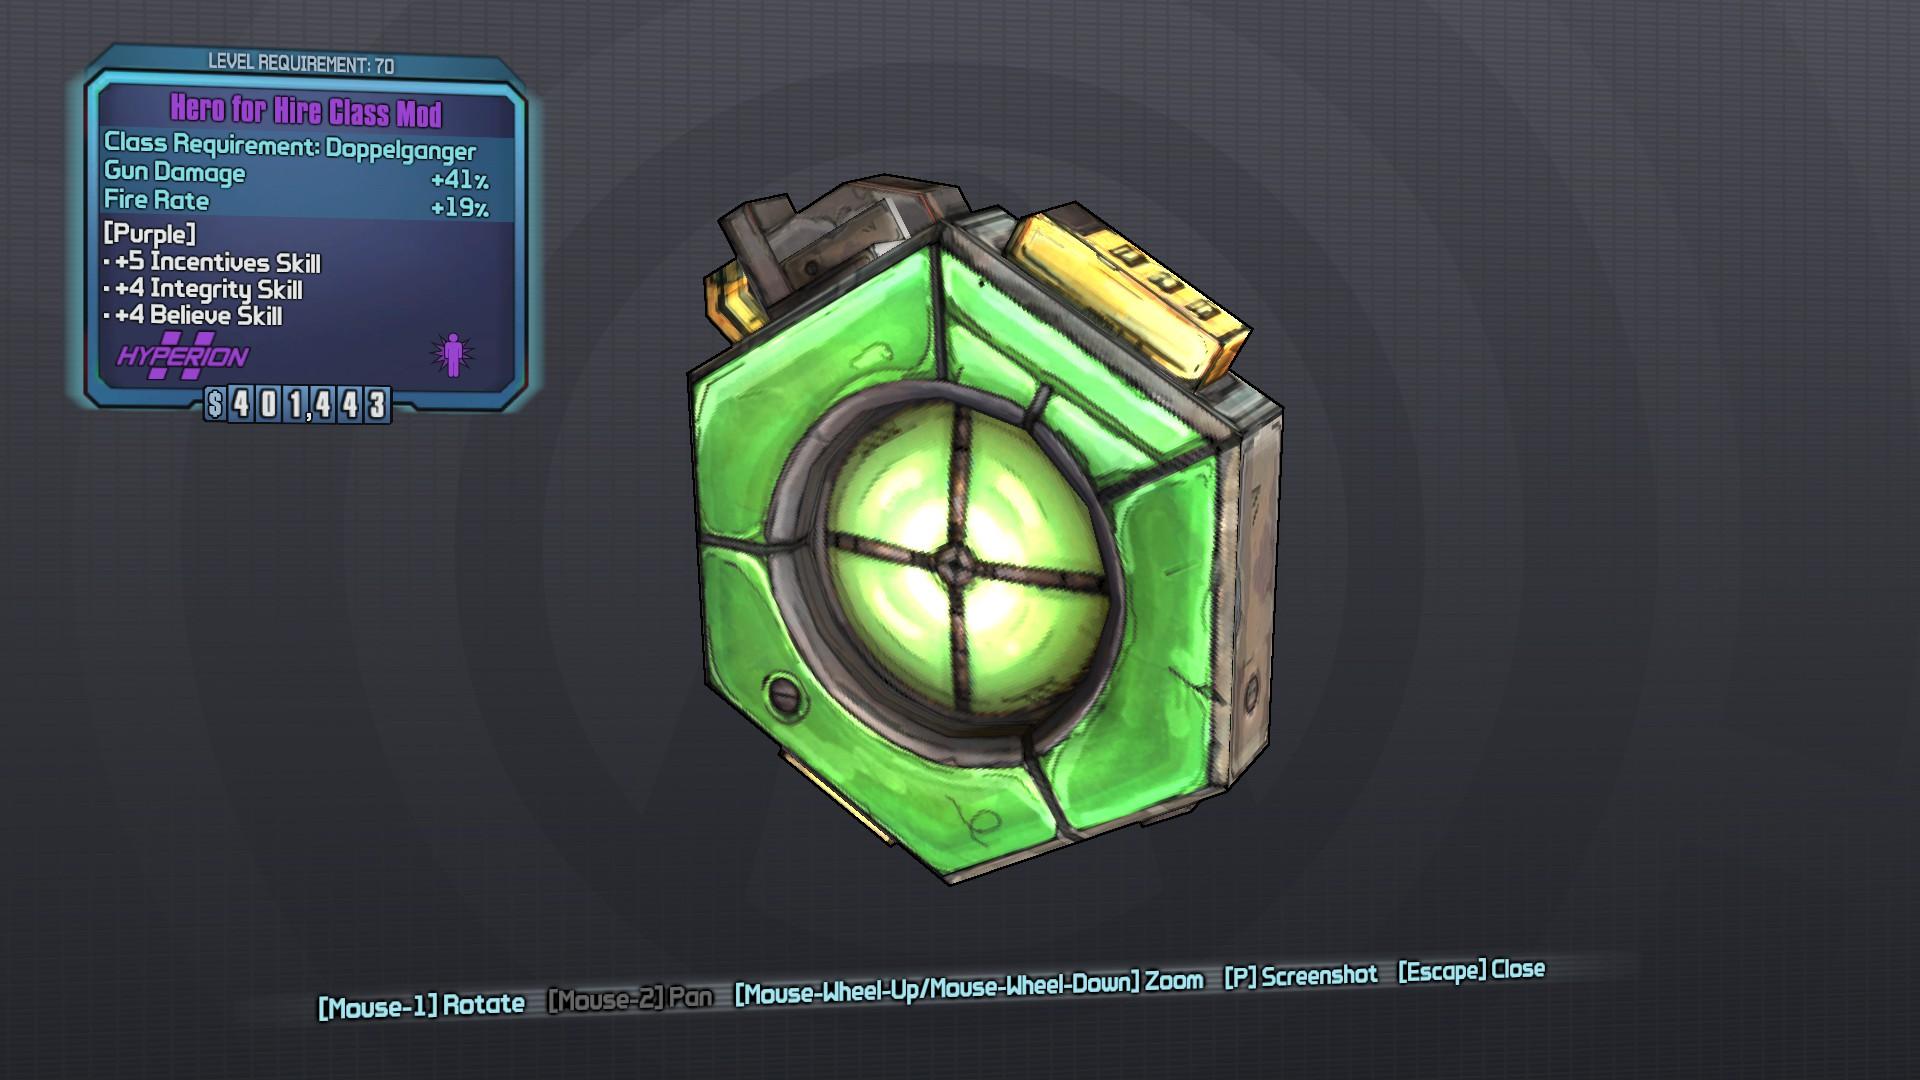 Hero (class mod)